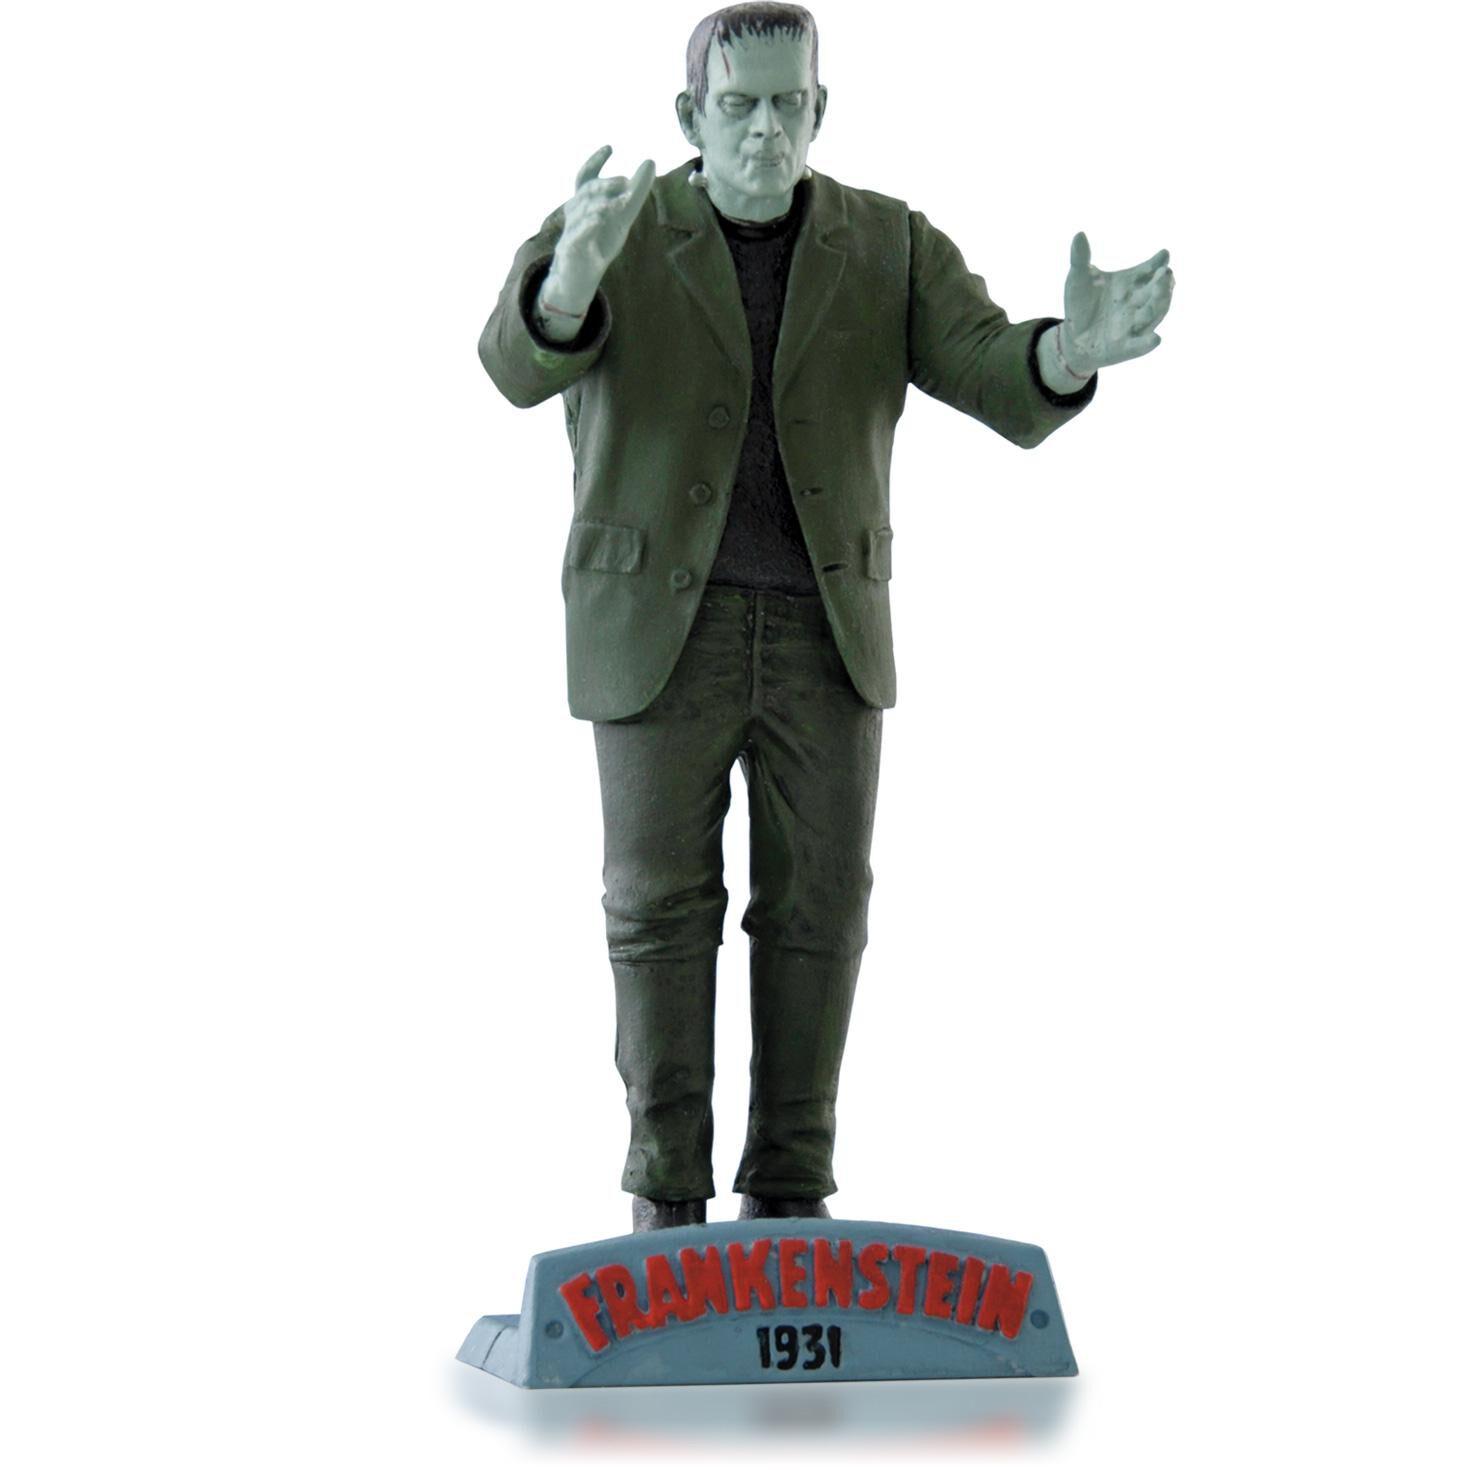 Frankenstein's Monster - Keepsake Ornaments - Hallmark